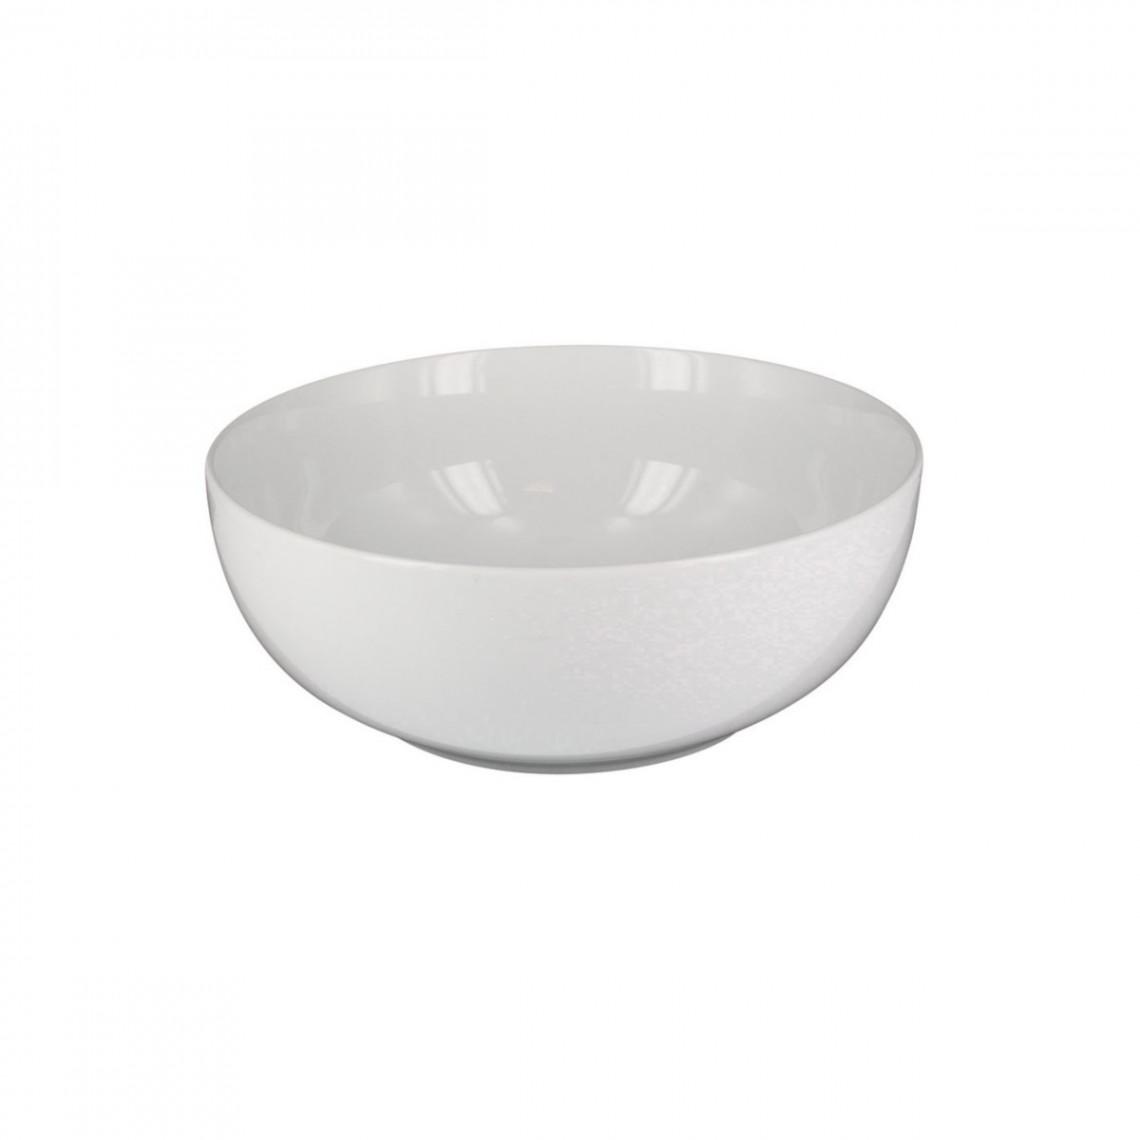 Saladier rond porcelaine Norma (Ø23)